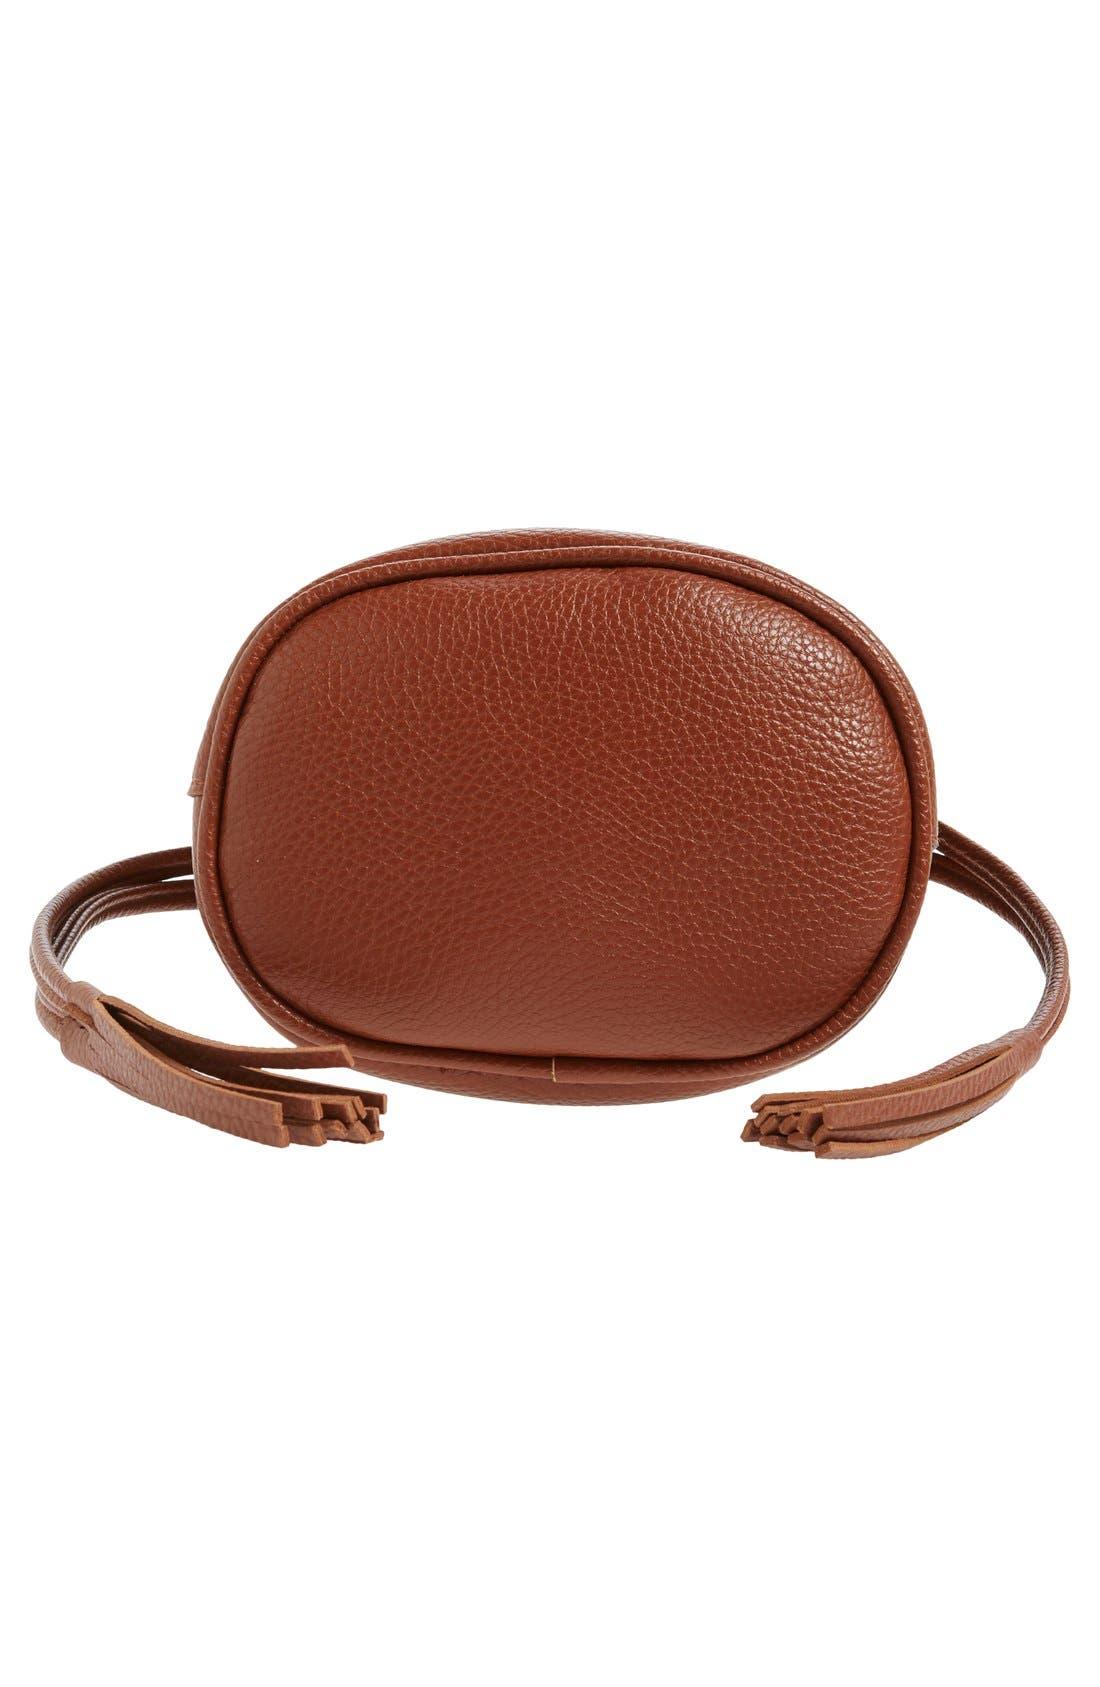 Mini Faux Leather Tassel Bucket Bag,                             Alternate thumbnail 18, color,